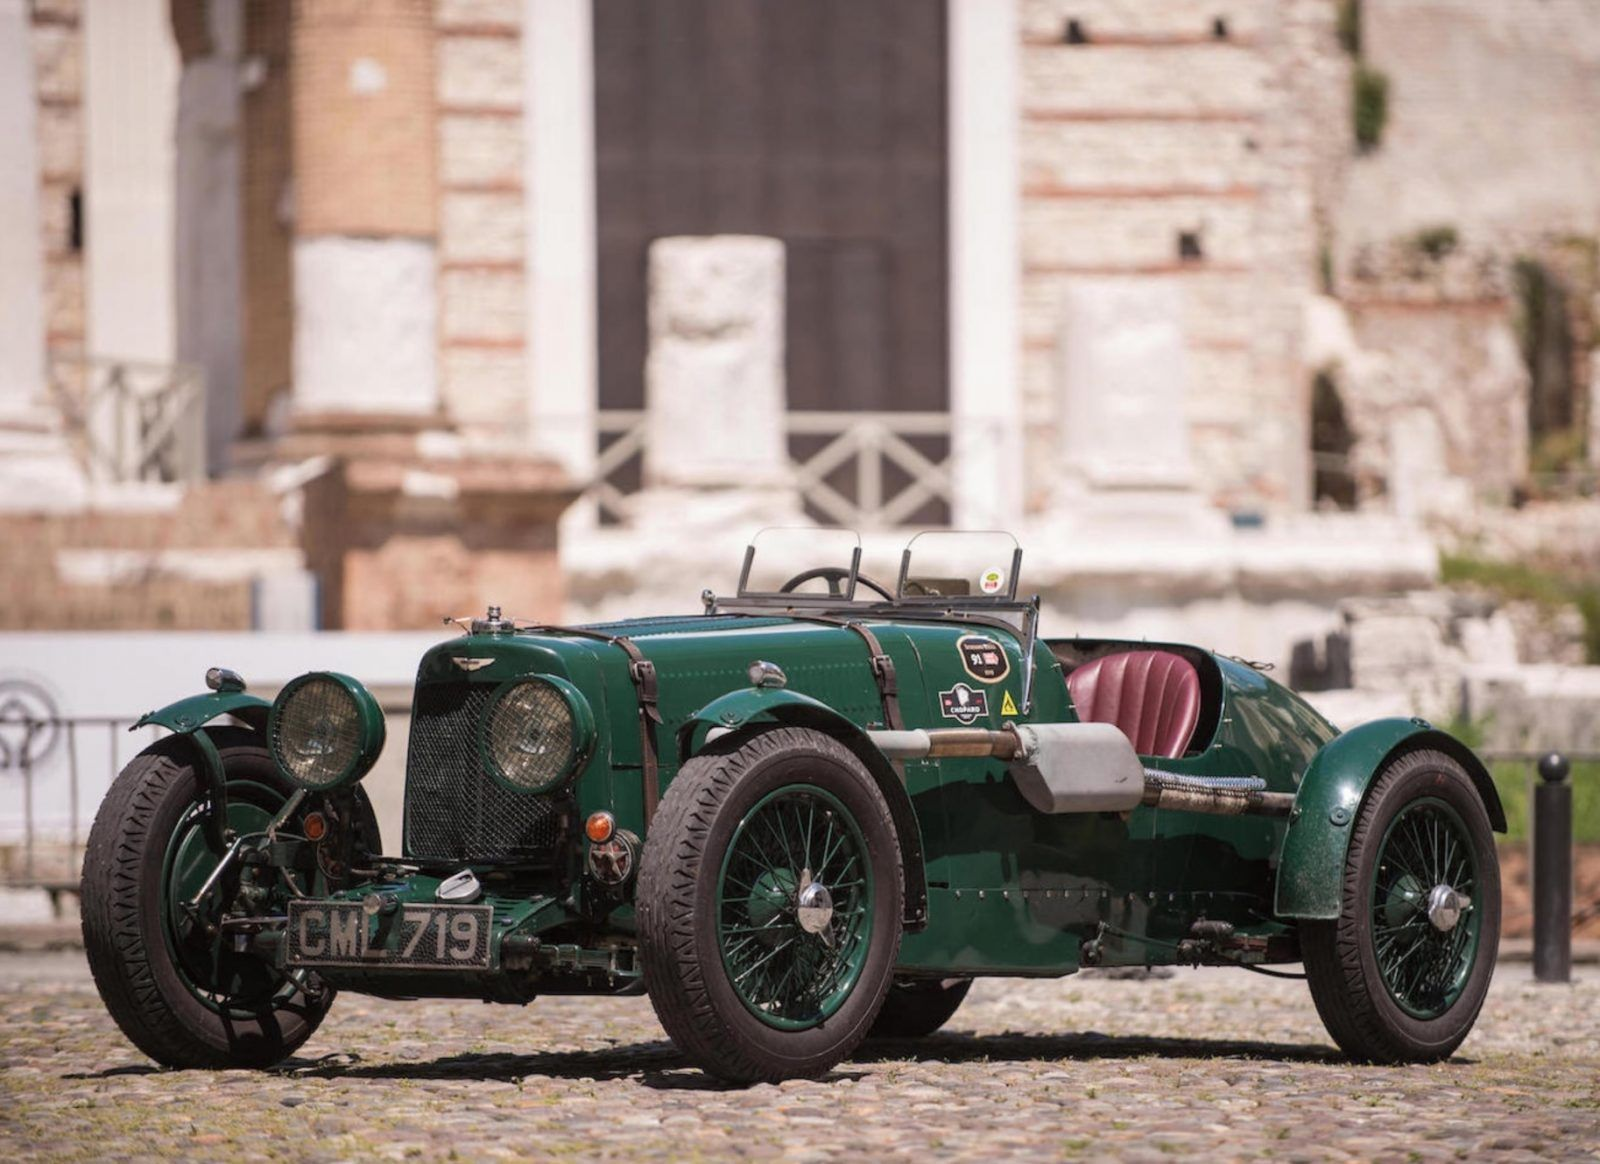 1935 Aston Martin Ulster Le Mans Works Racer Aston Martin Classic Aston Martin Classic Cars